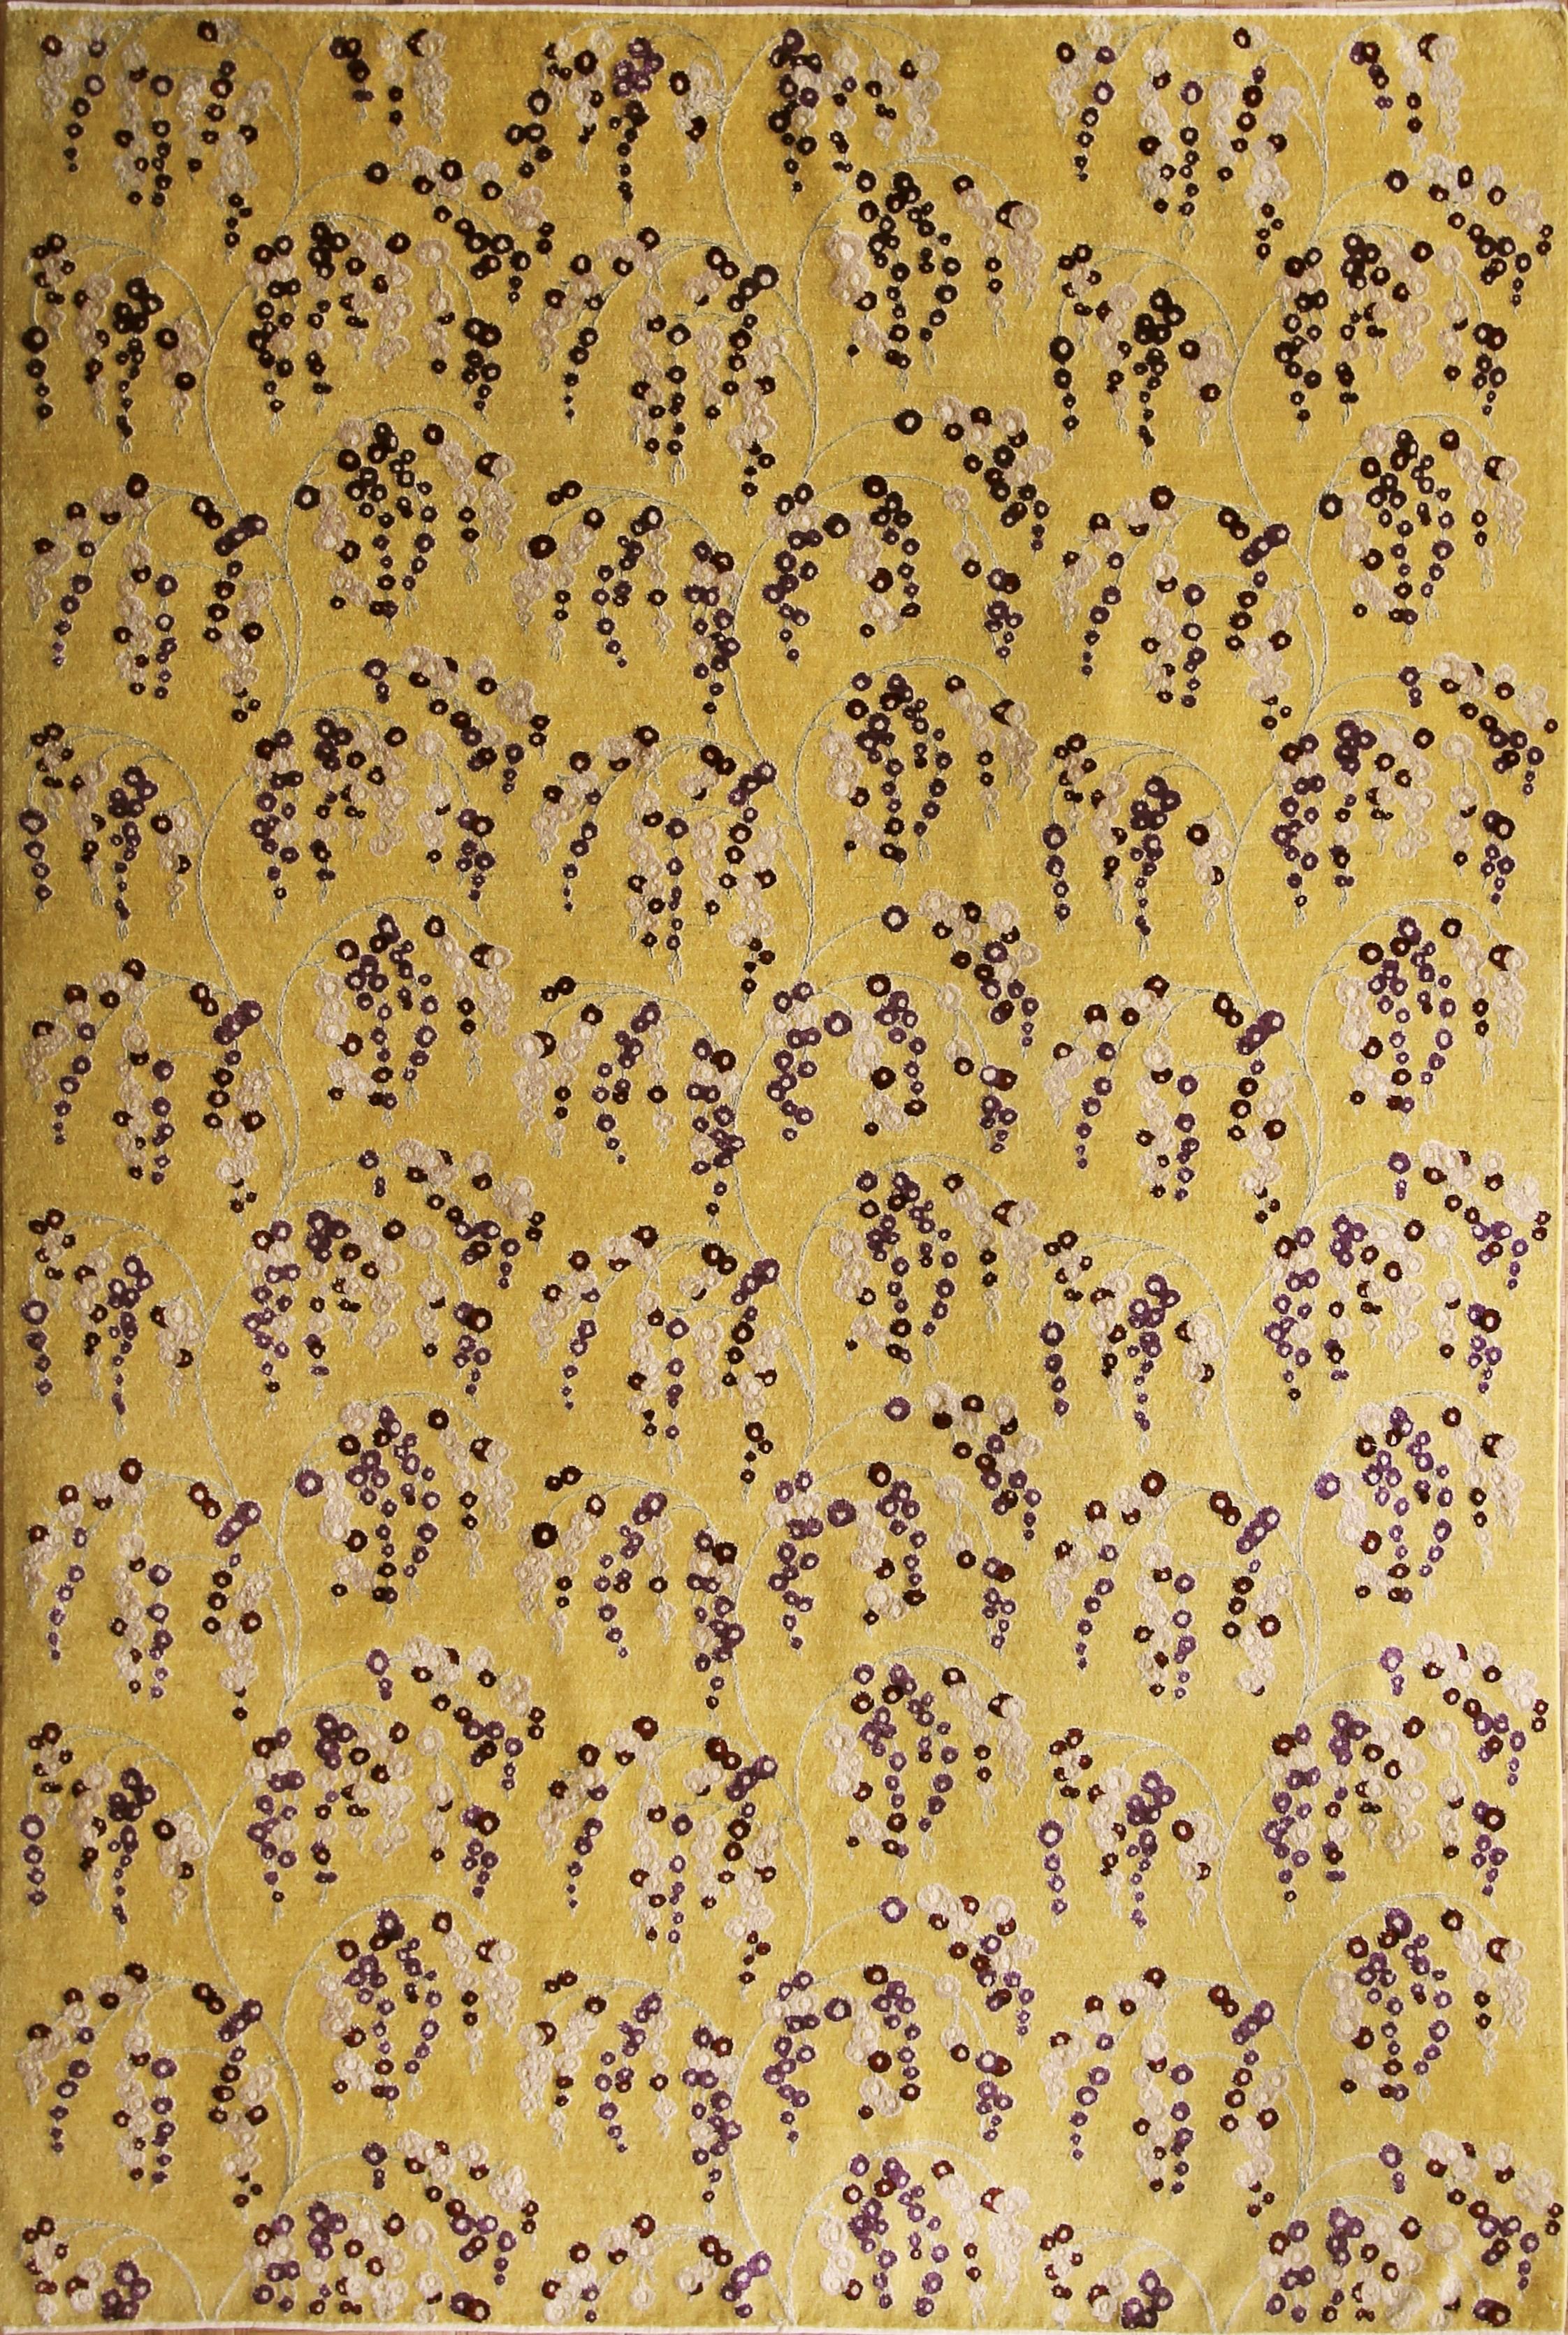 218 Gashgai Kashkuli, Persia, silk and wool 6'8'' x 9'10''